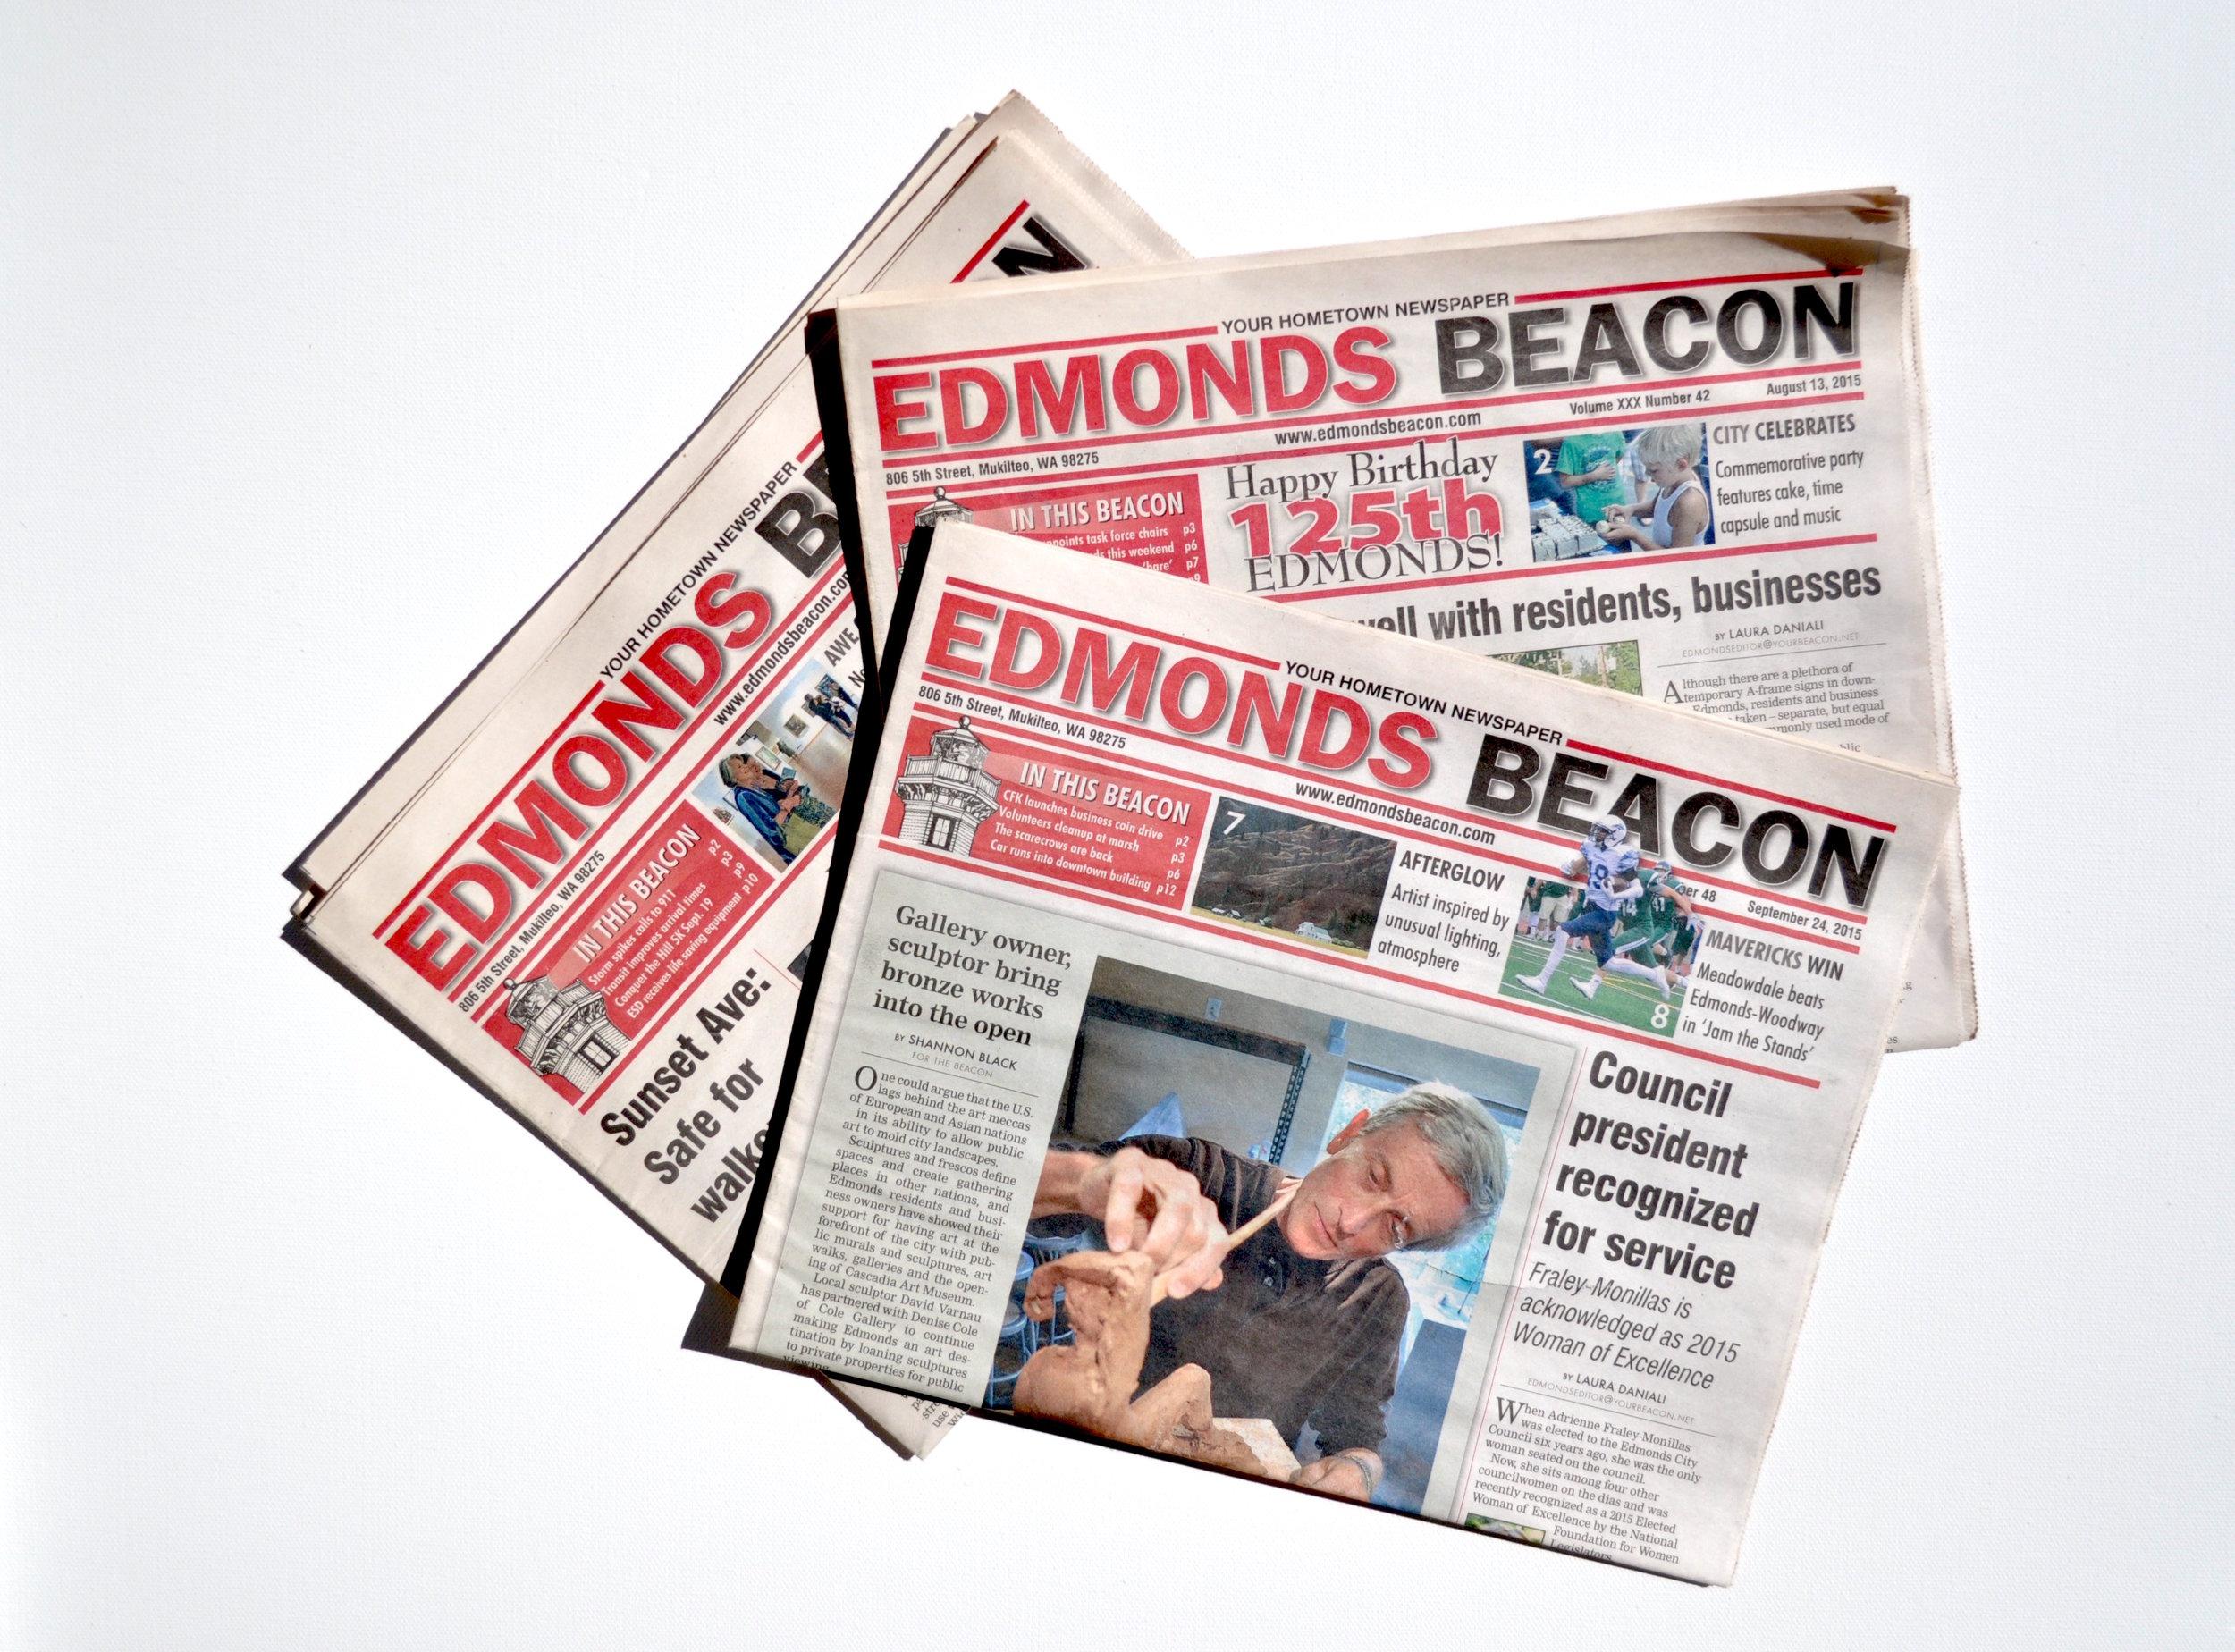 Shannon Black writer and photographer for Edmonds Beacon